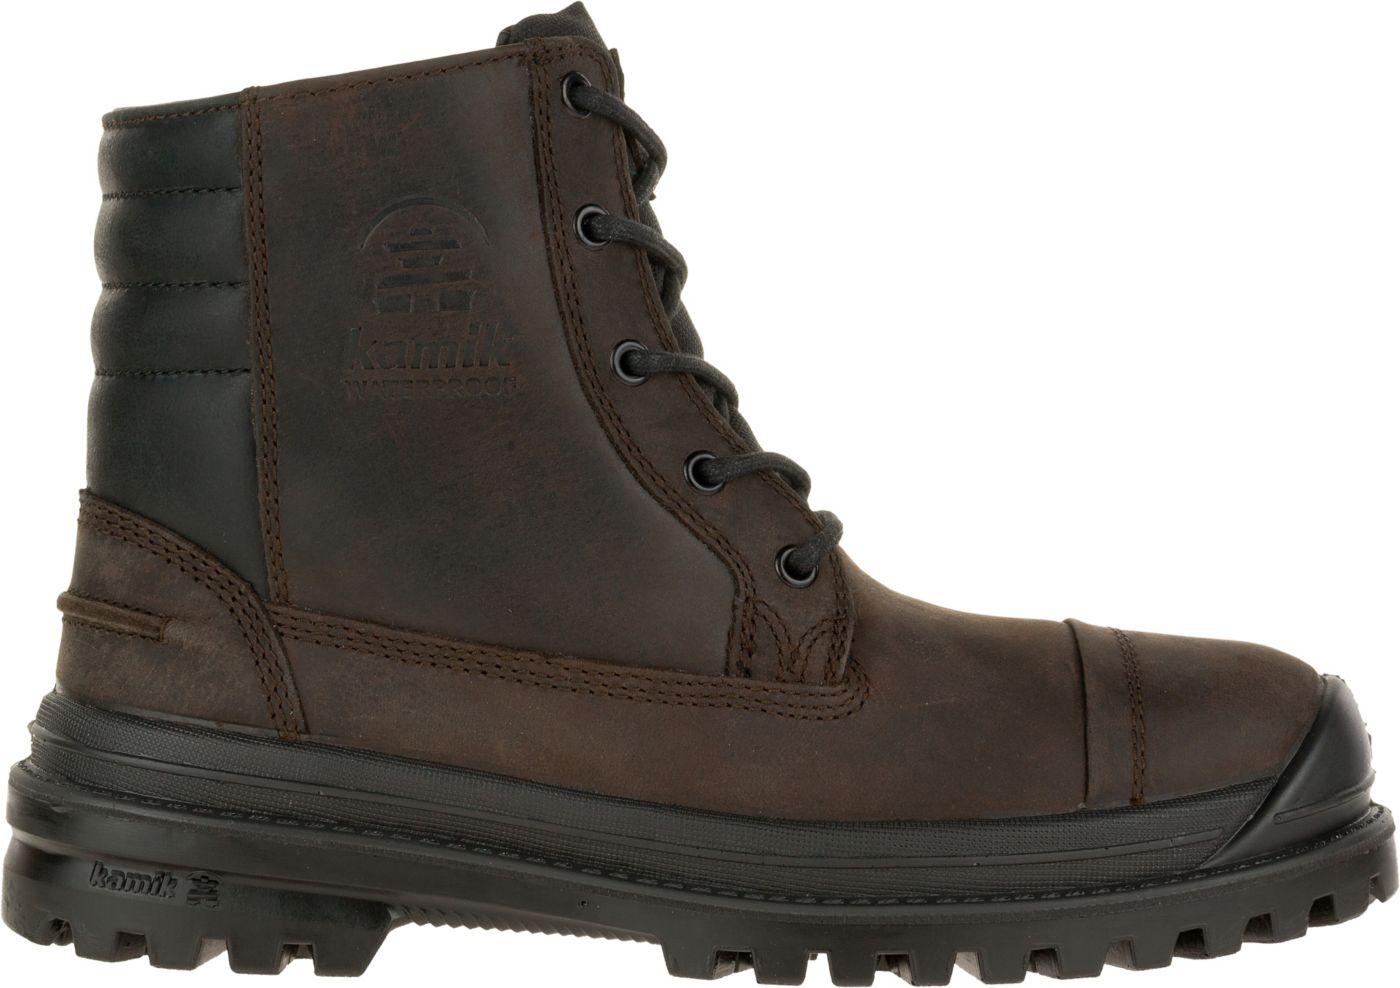 Kamik Men's Griffon 200g Waterproof Winter Boots